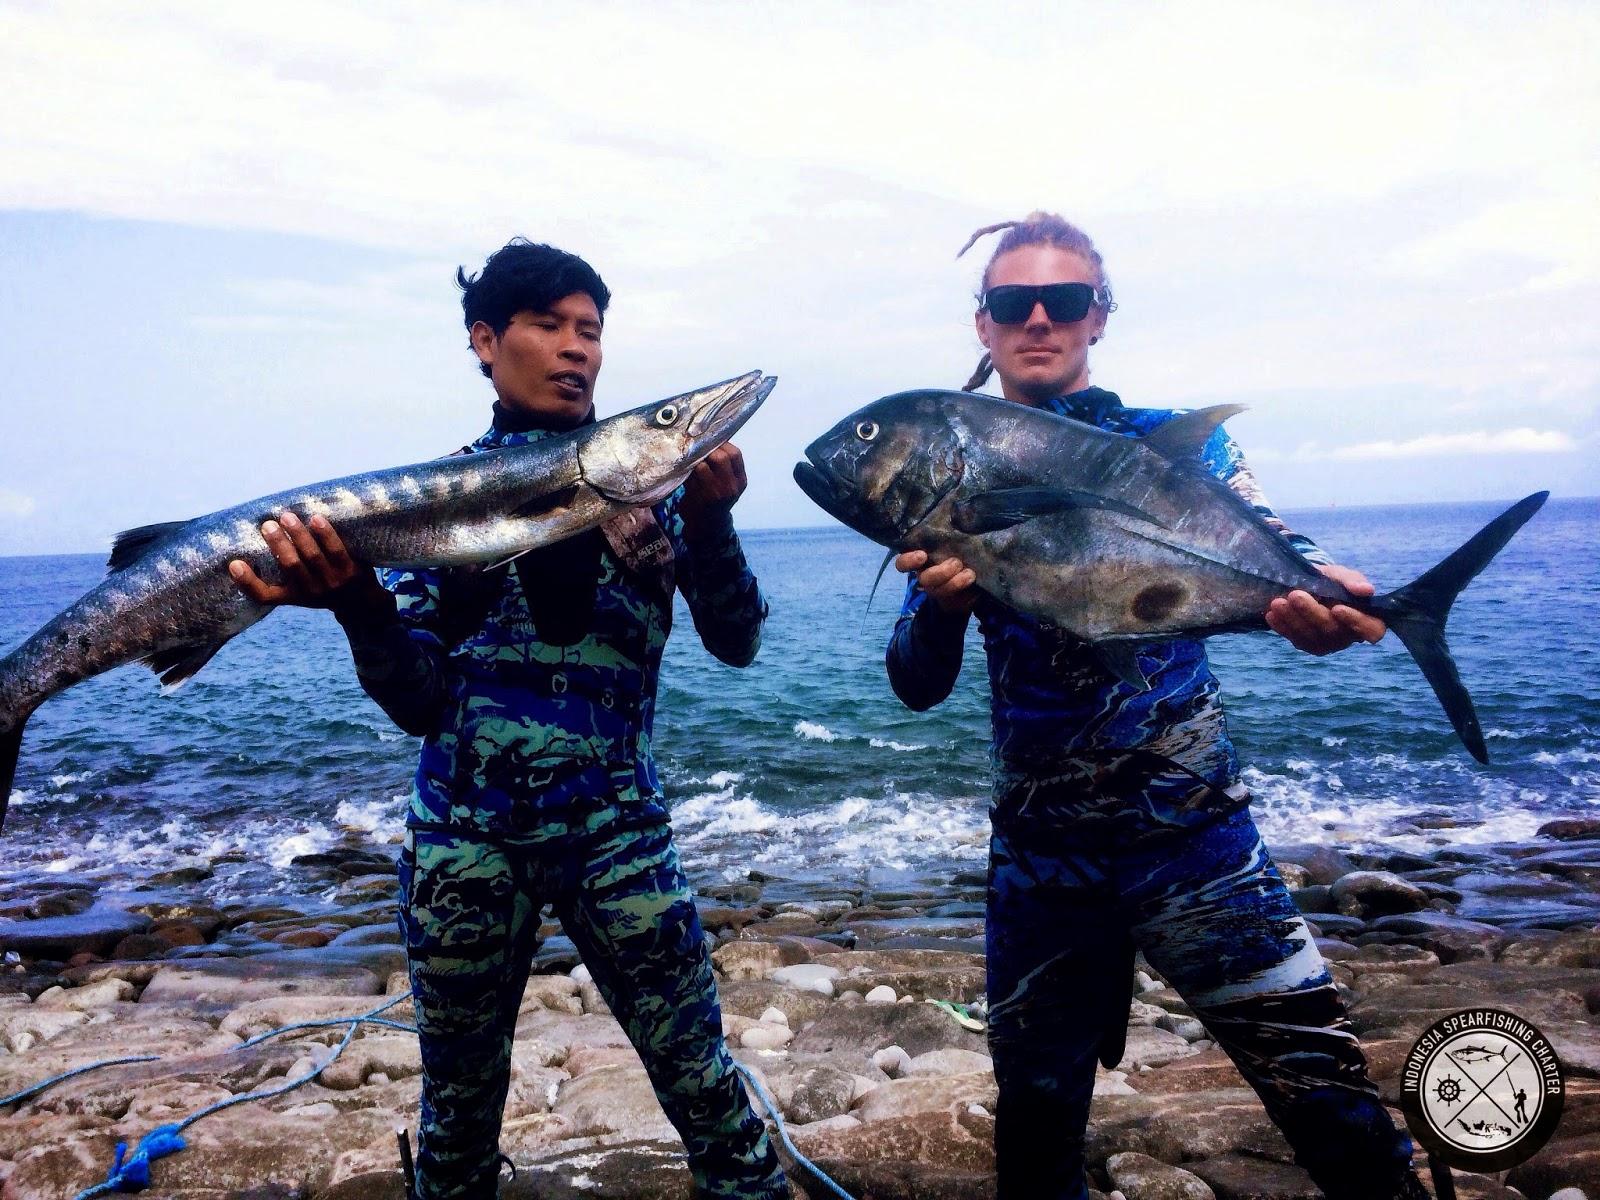 Spearfishing Bali Indonesia, Nusa Penida , Amed GT, Giant Trevally, Dogtooth Tuna, Parrotfish, Coronation Trout, Bluefin Trevally, Black Trevally, Mu, Barracuda, Mu, Maori Seaperch